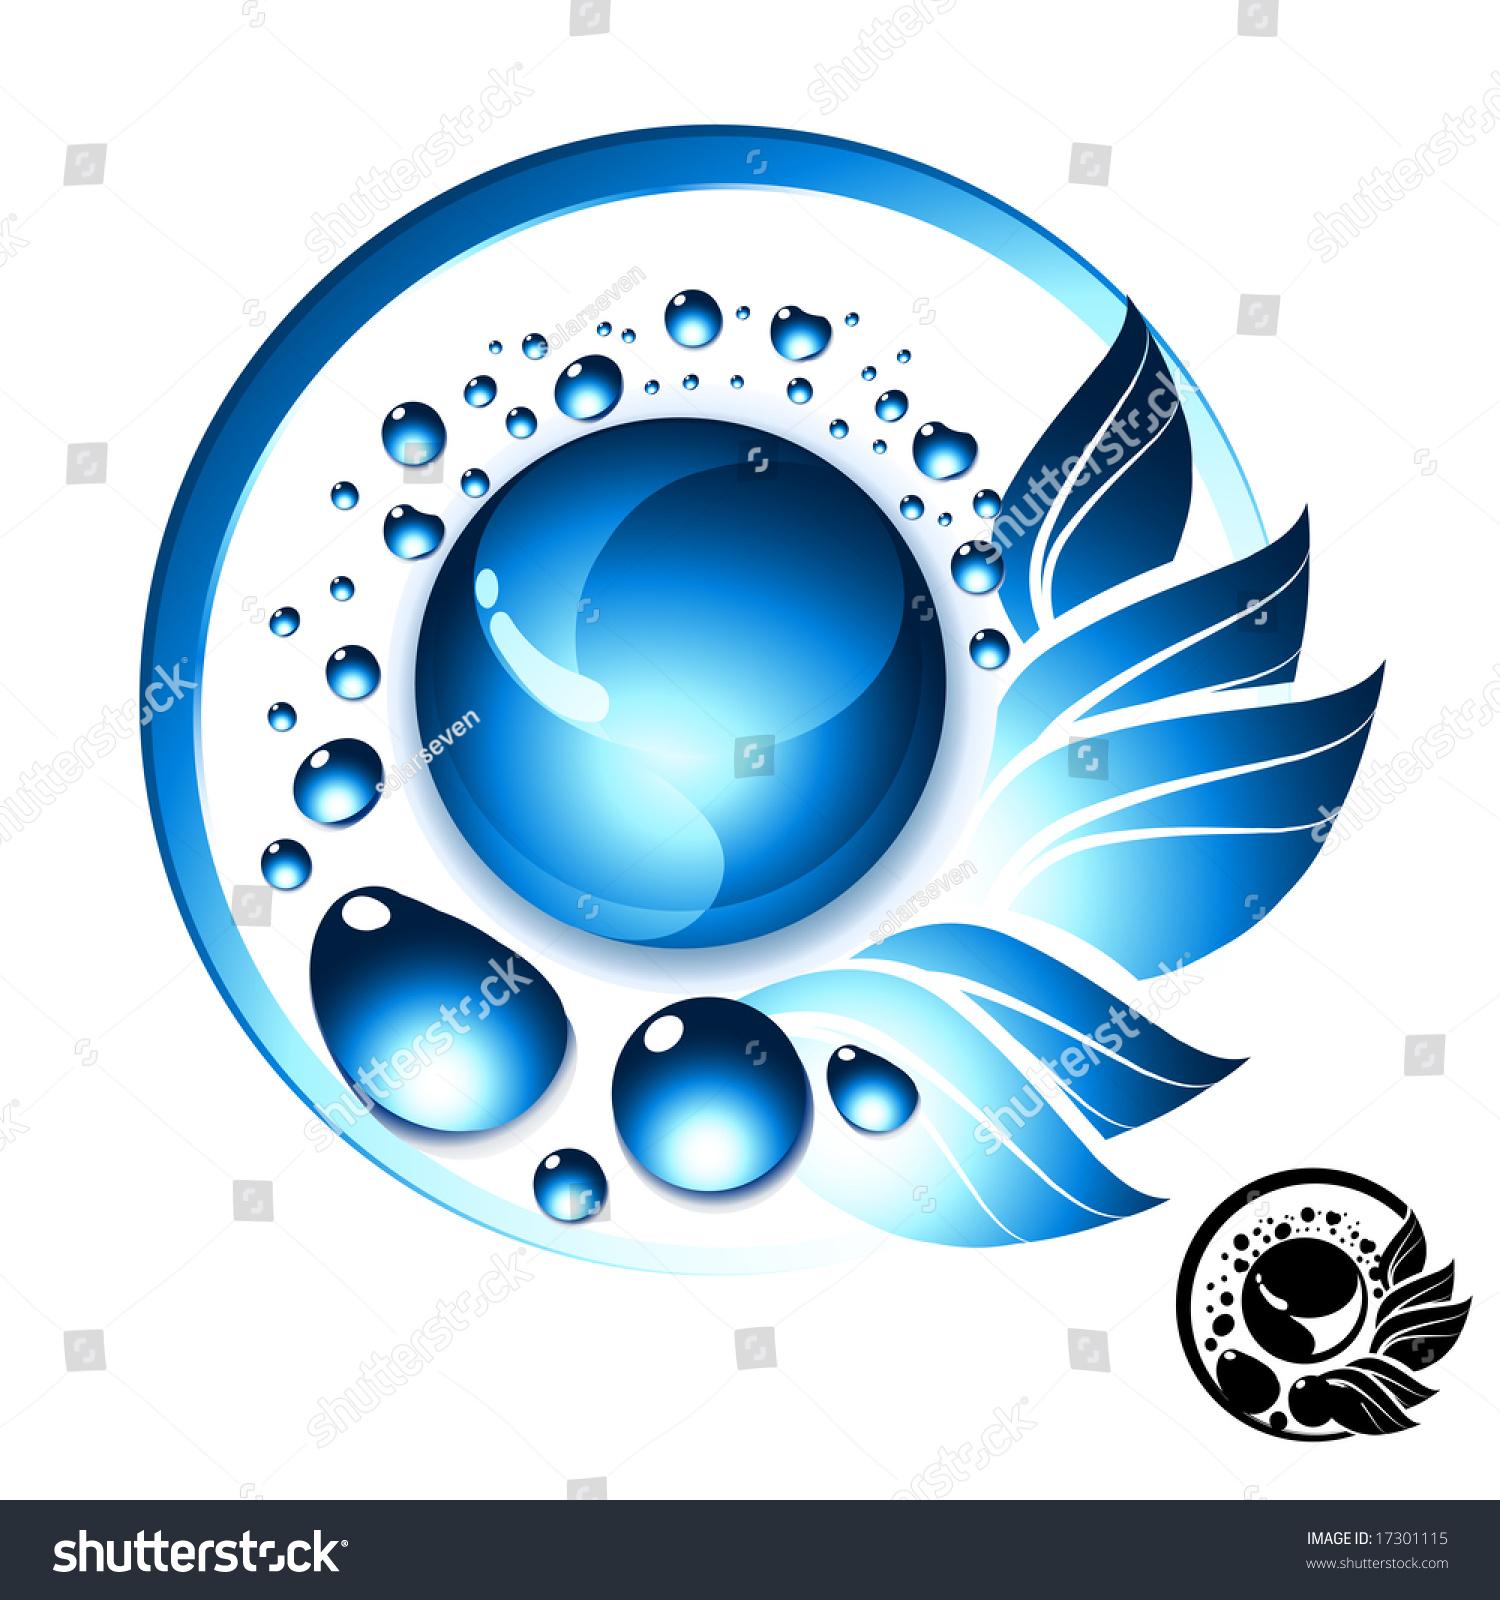 Image Gallery pure symbol